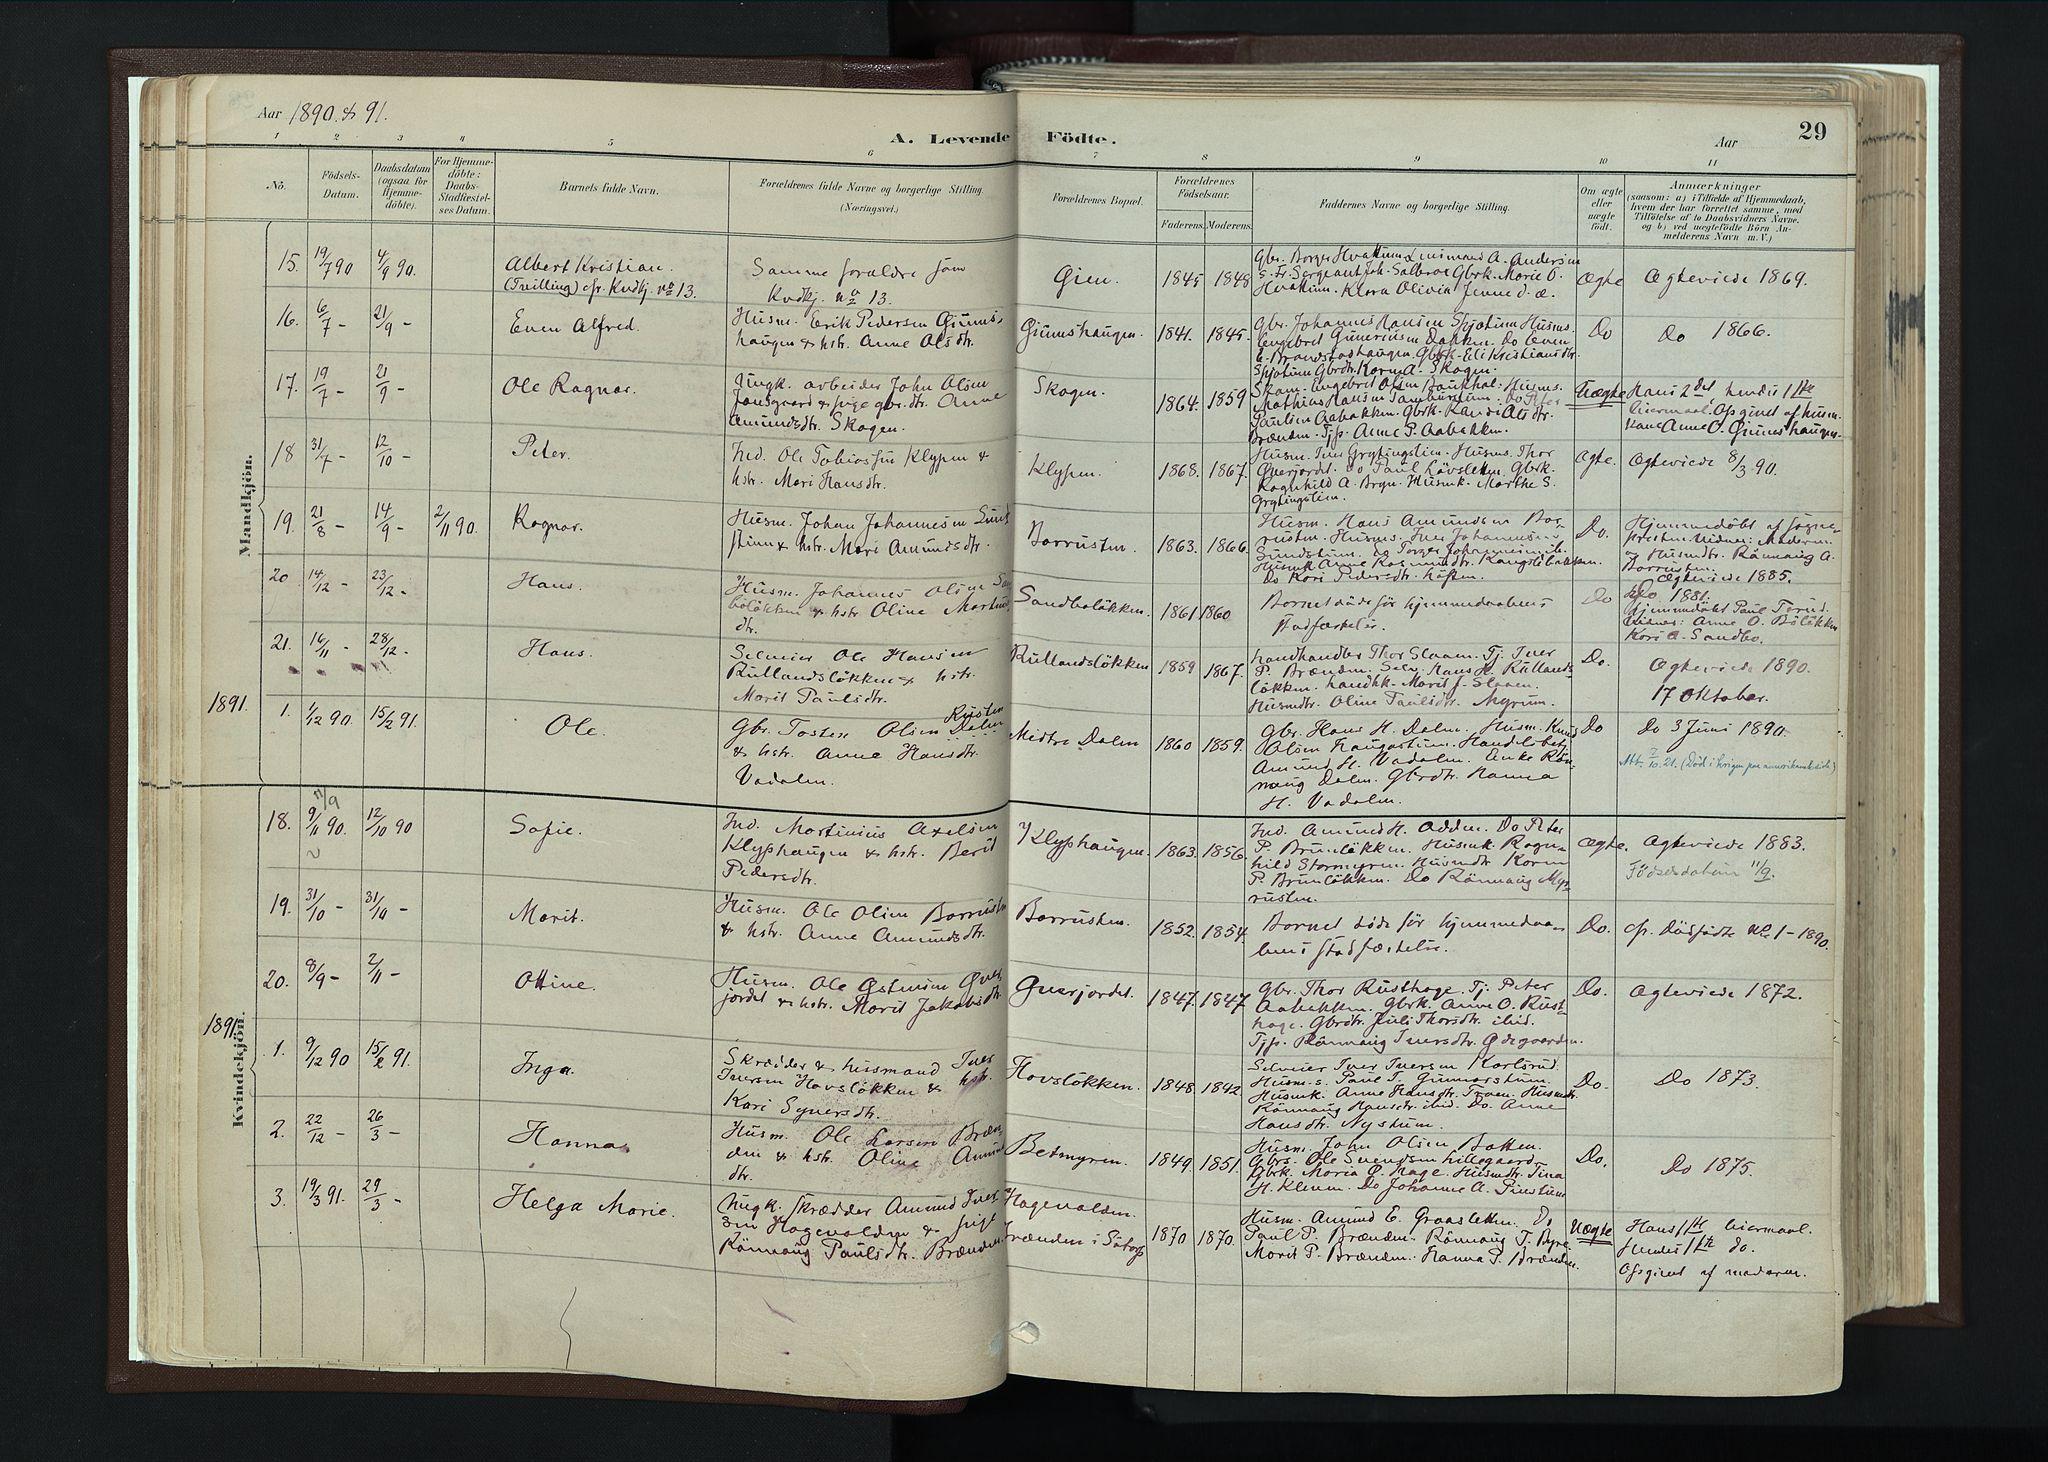 SAH, Nord-Fron prestekontor, Ministerialbok nr. 4, 1884-1914, s. 29